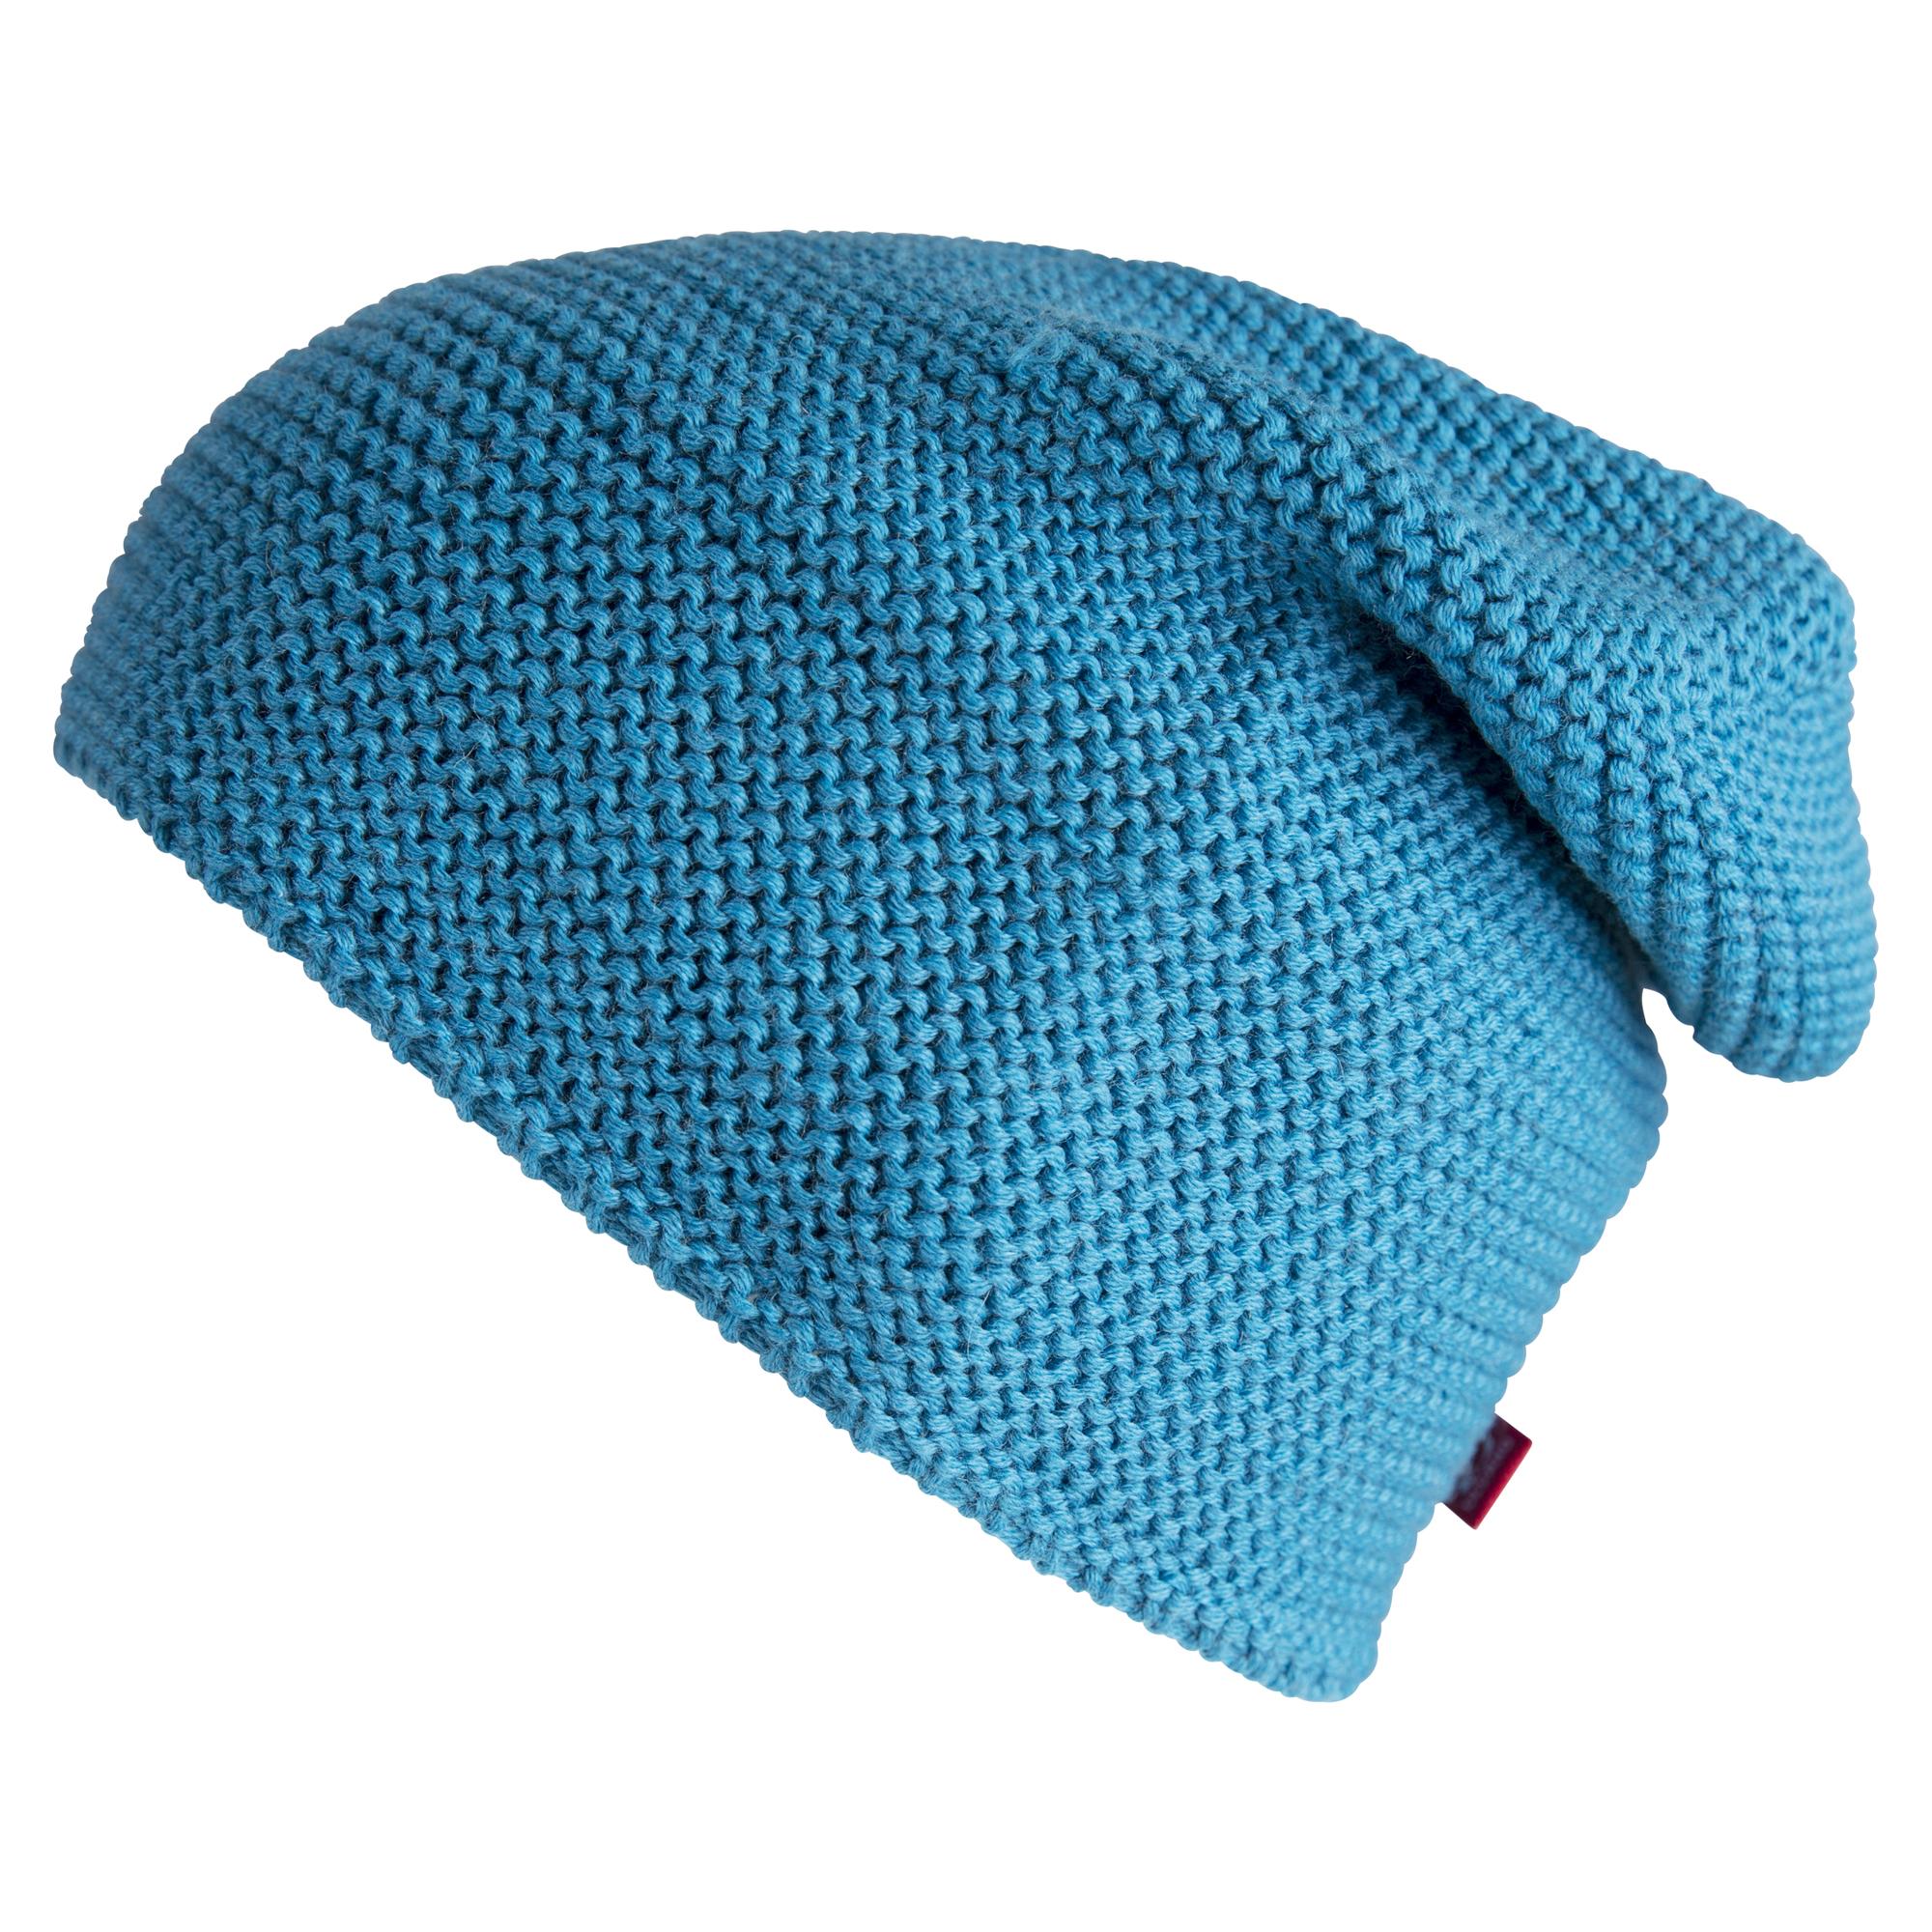 Ulvang Hamna Hat - Uld hue - Blå | Headwear